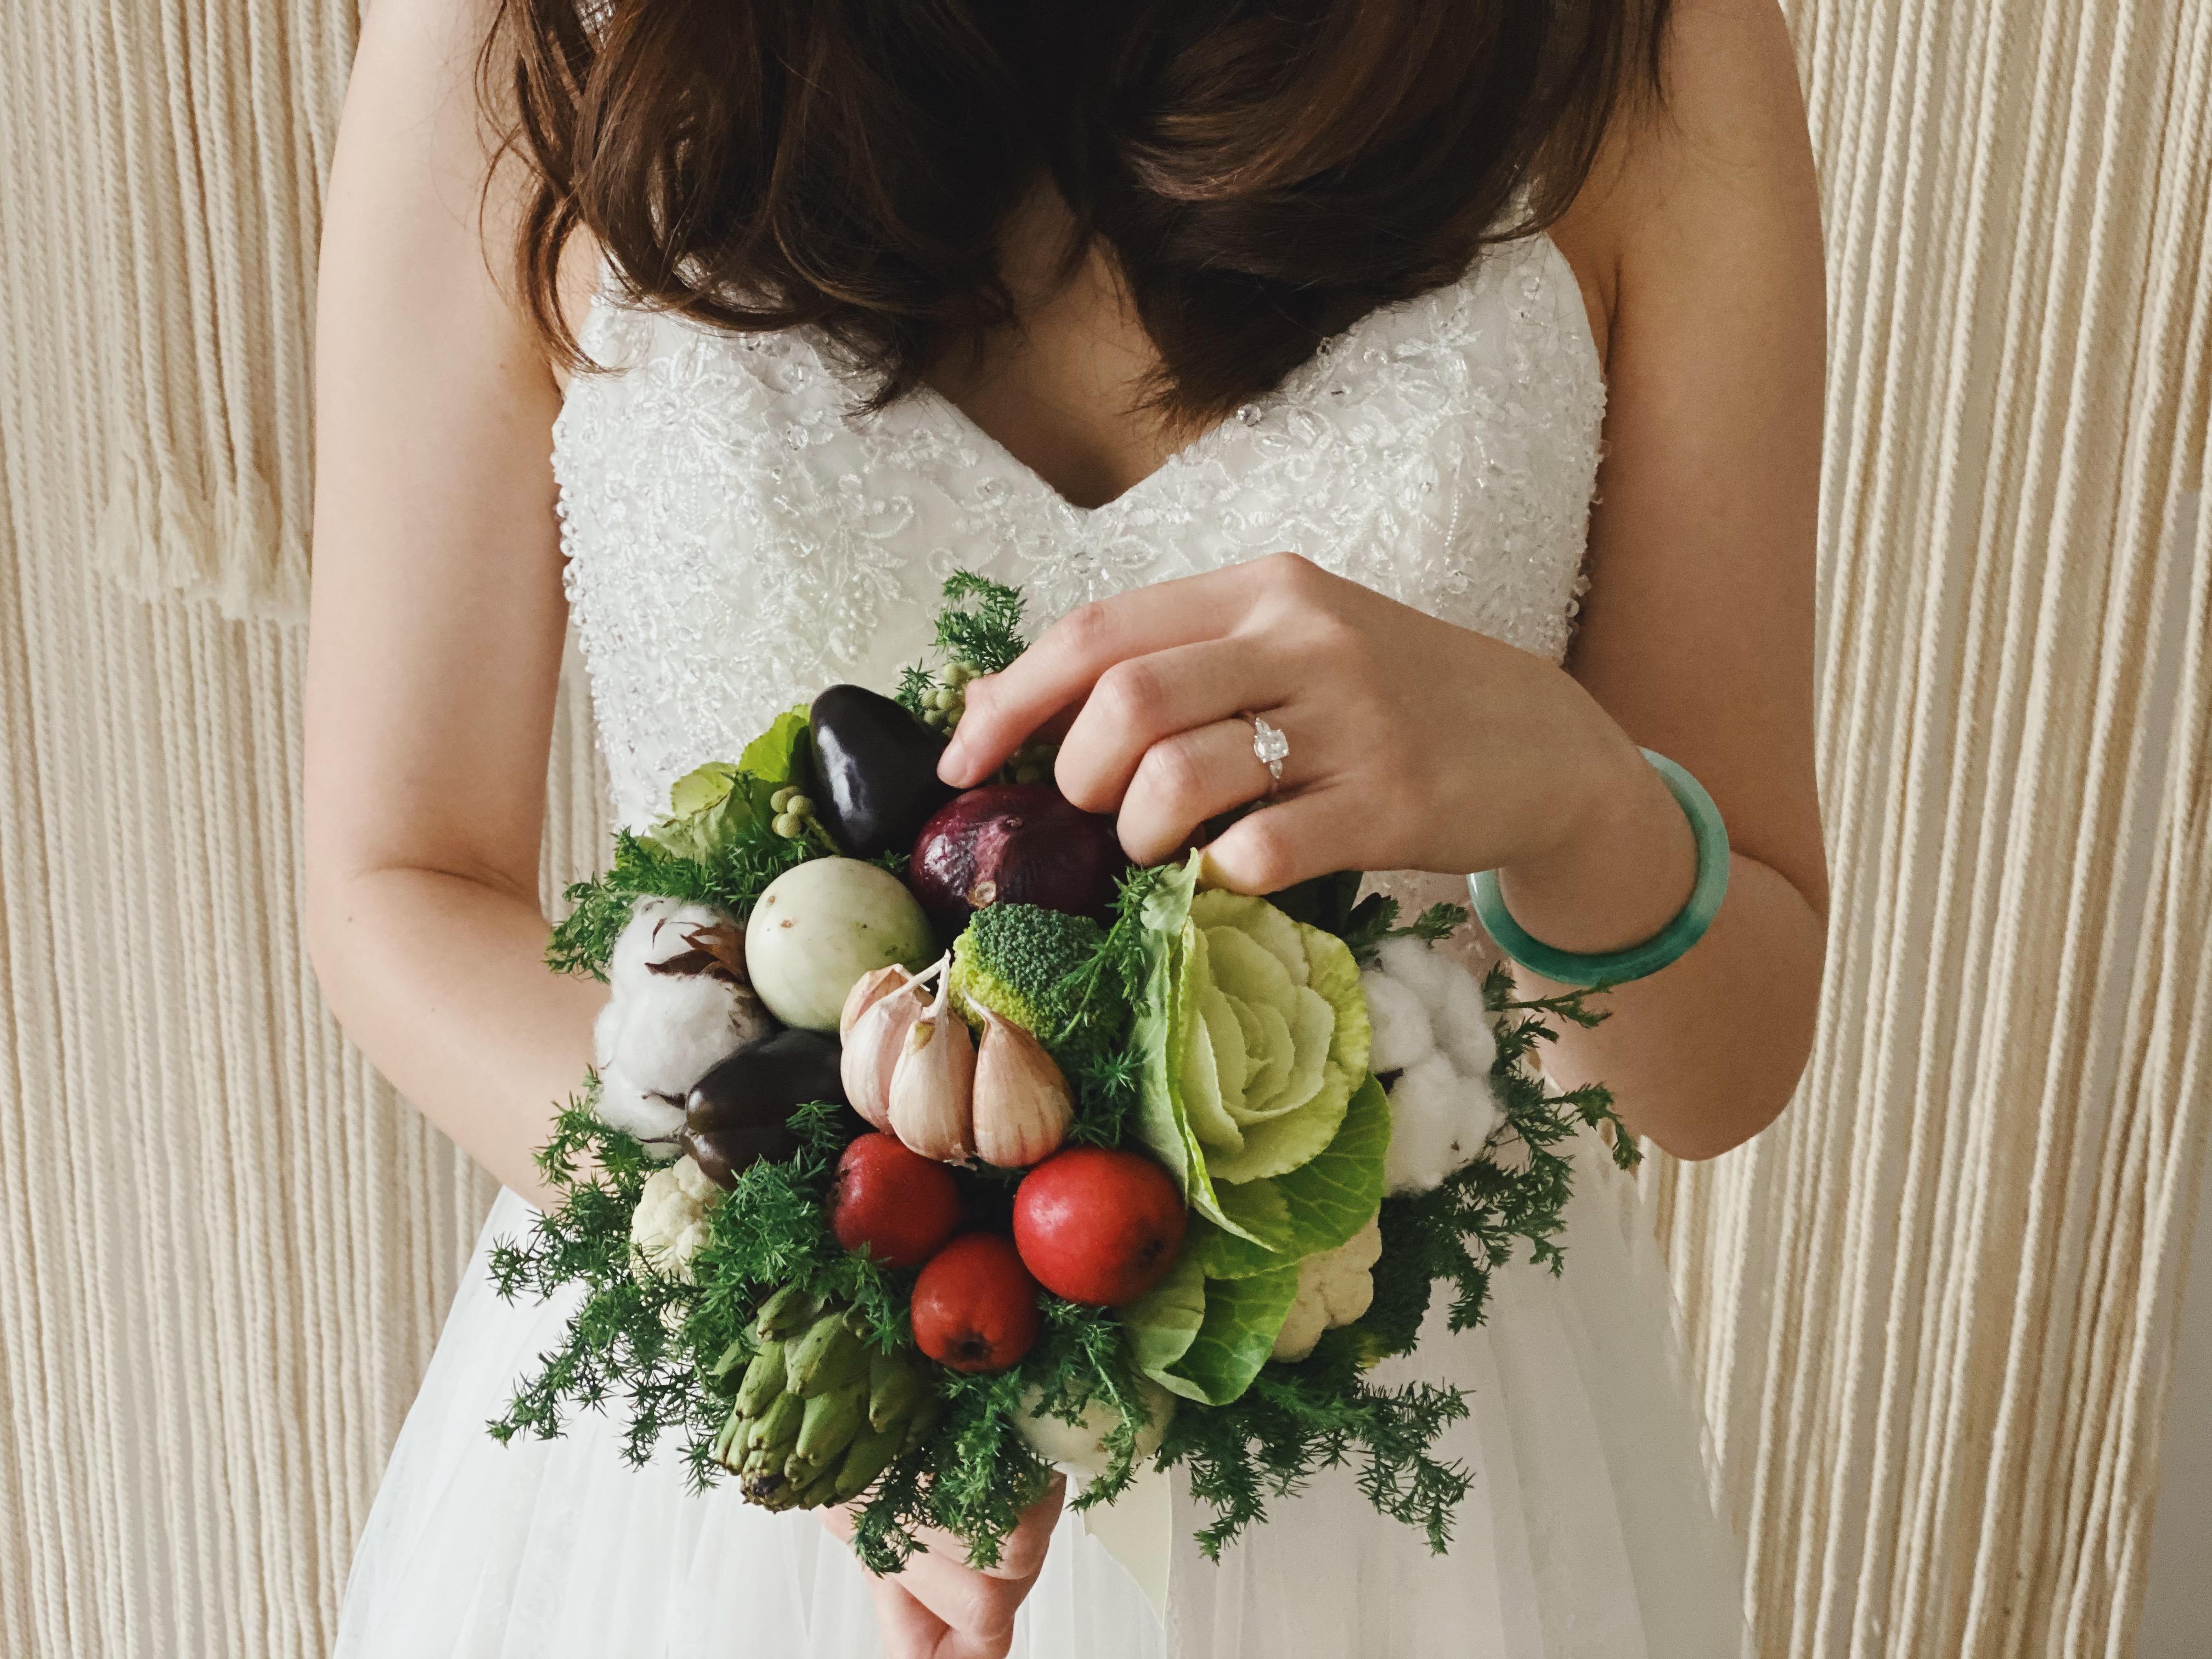 Veggie hand-held bridal bouquet